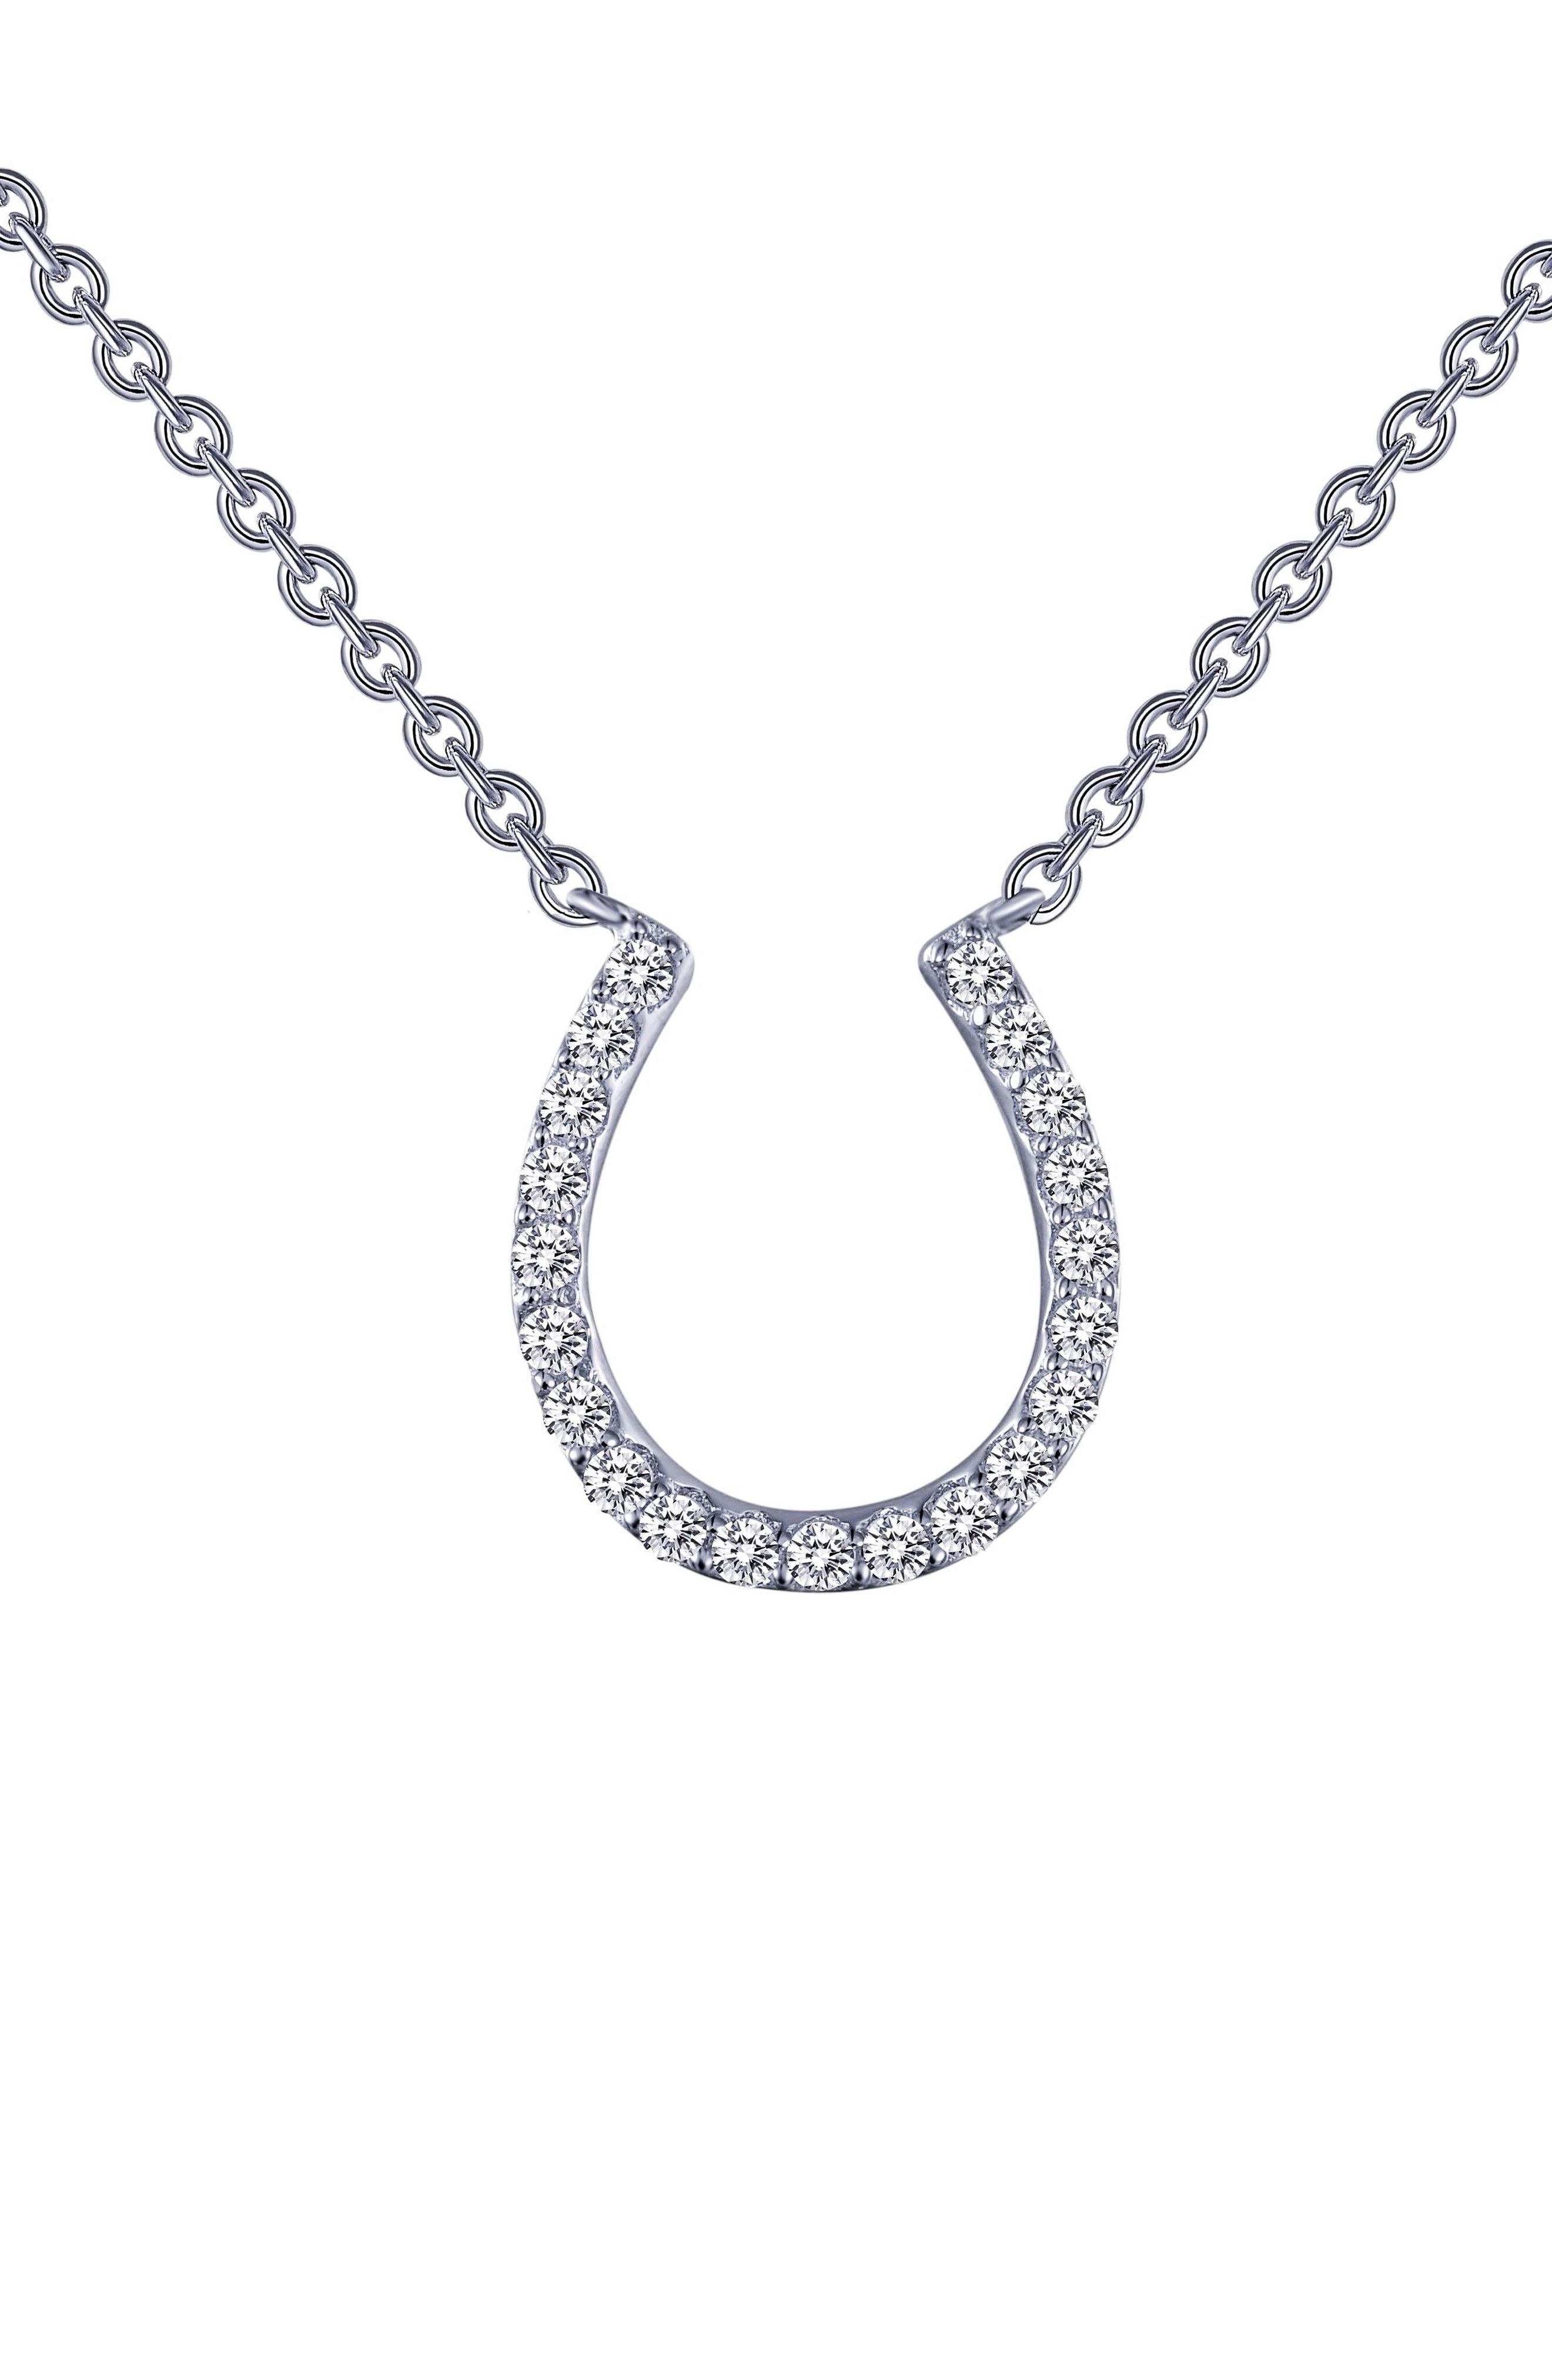 Horseshoe Simulated Diamond Pendant Necklace,                             Main thumbnail 1, color,                             040